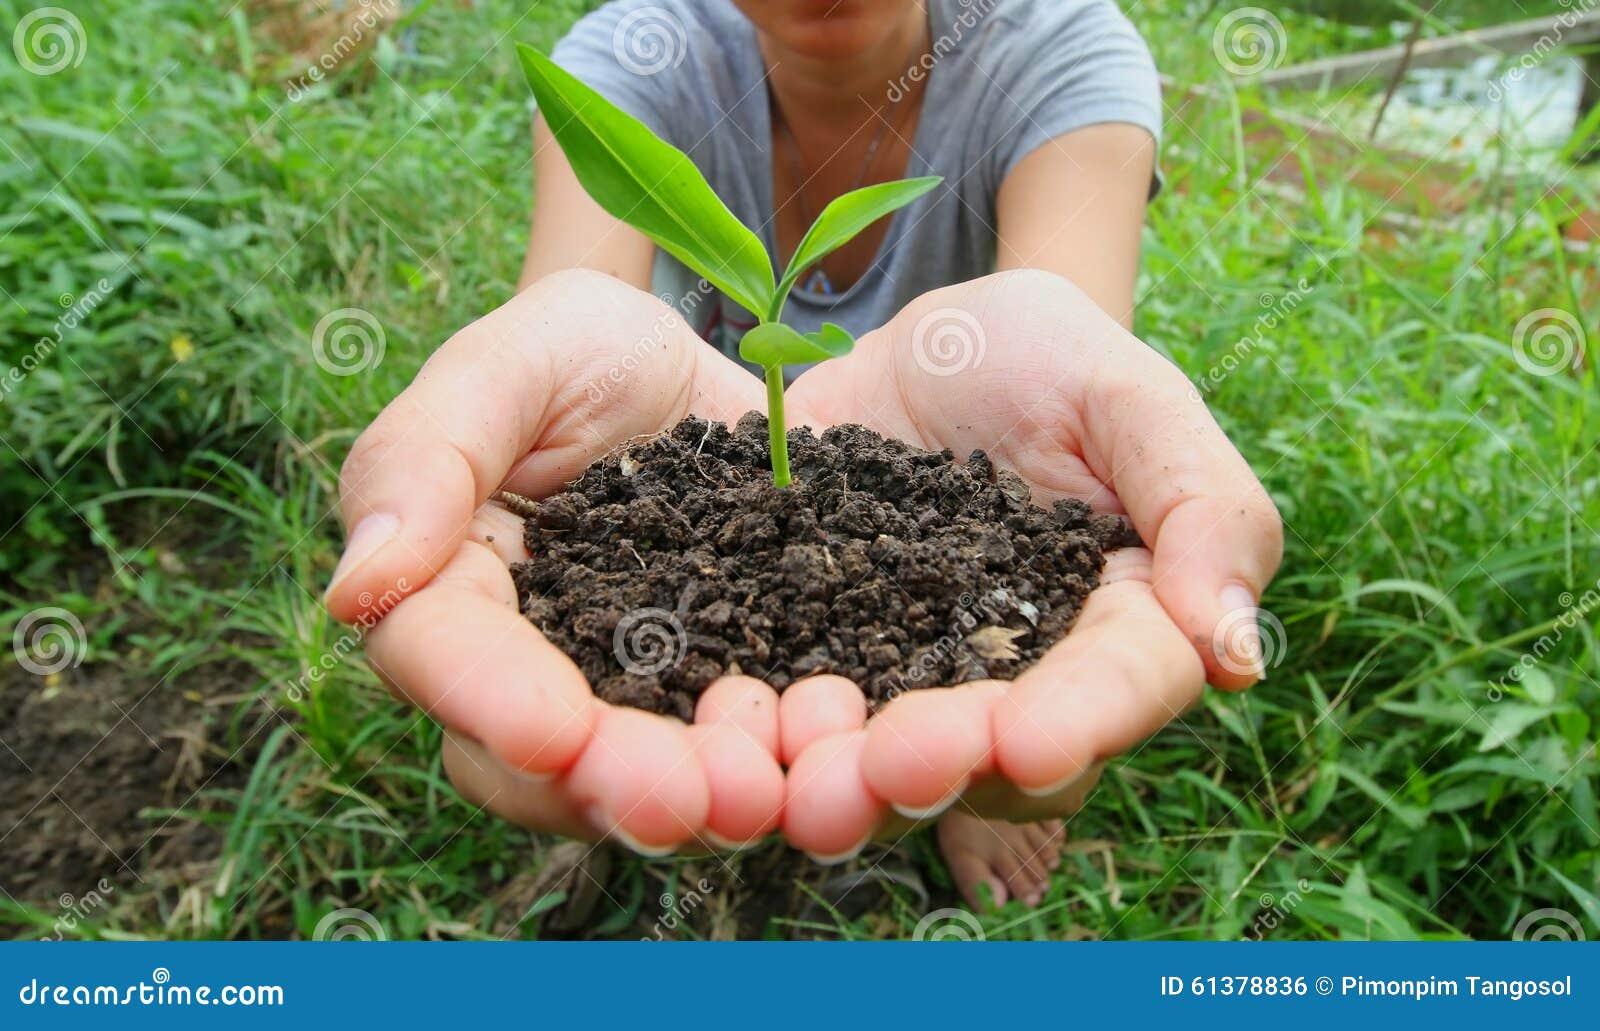 little green plant stock photo image 61378836. Black Bedroom Furniture Sets. Home Design Ideas